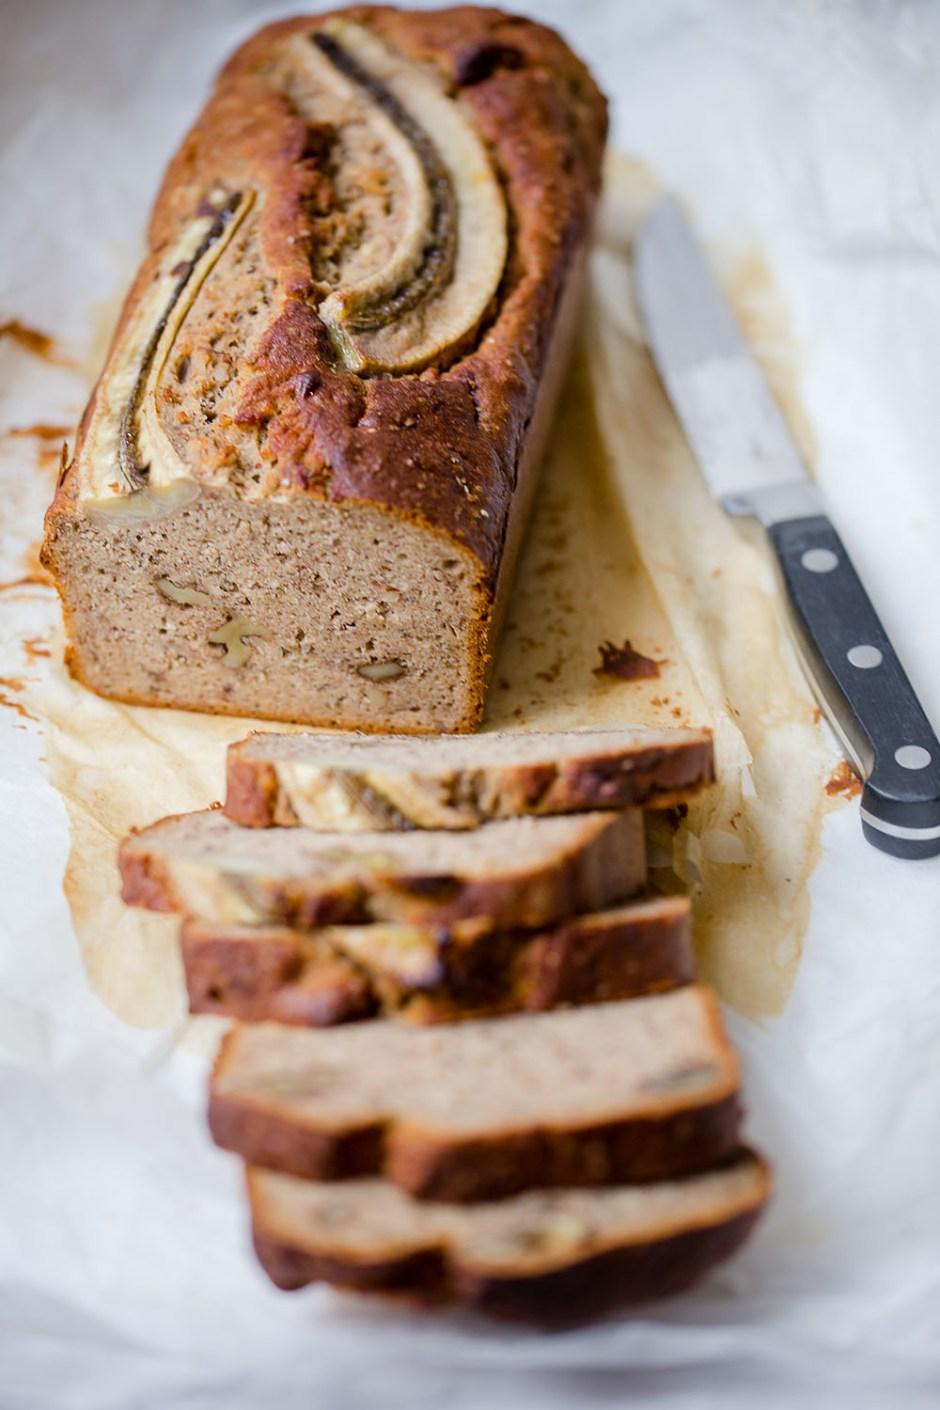 8-tokgott-bananbrod-med-bovete-insanely-delicious-buckwheat-banana-bread-5-vibrant-food-stories